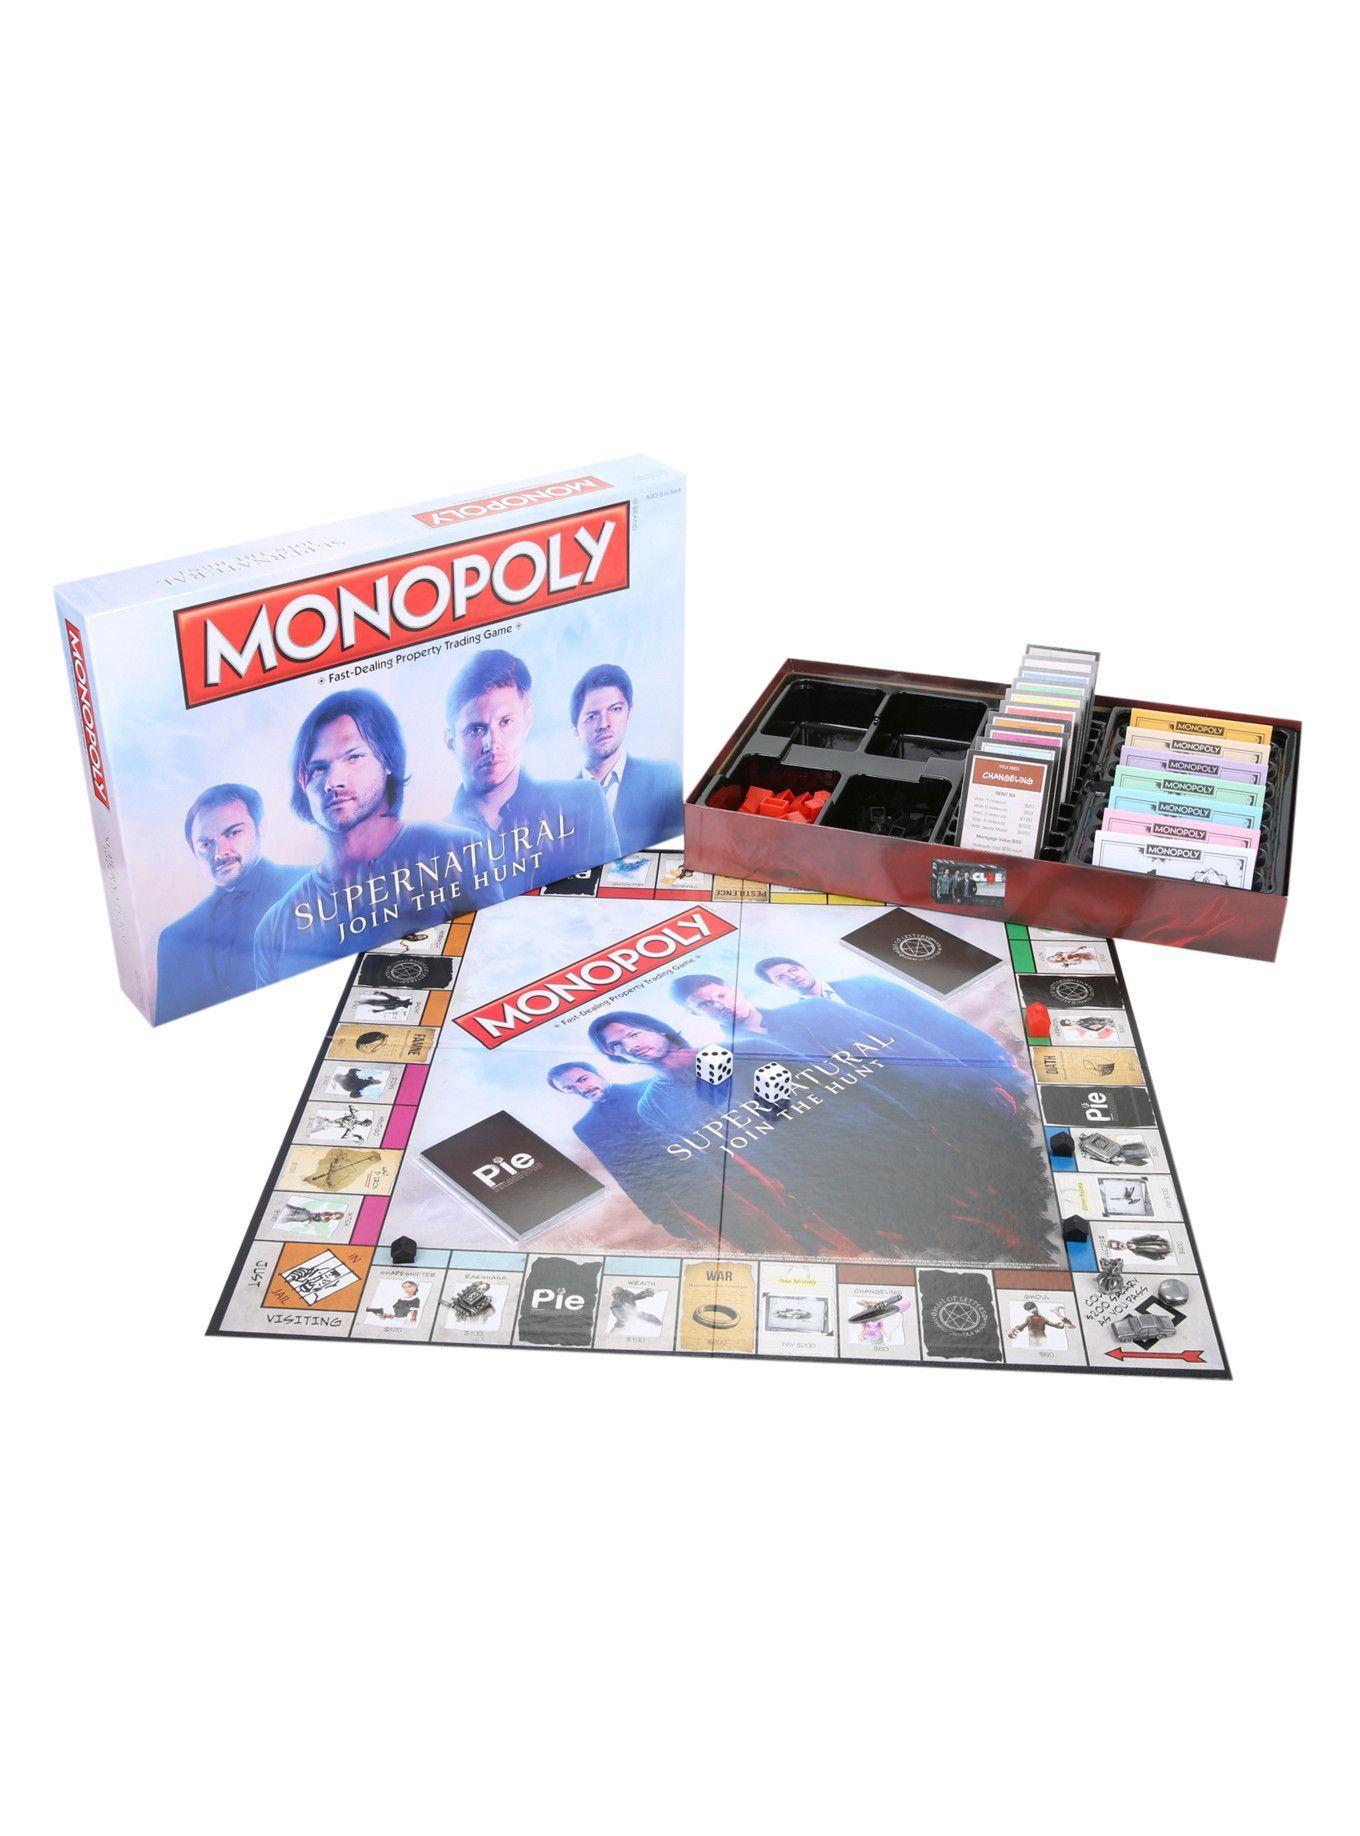 Monopoly supernatural board game